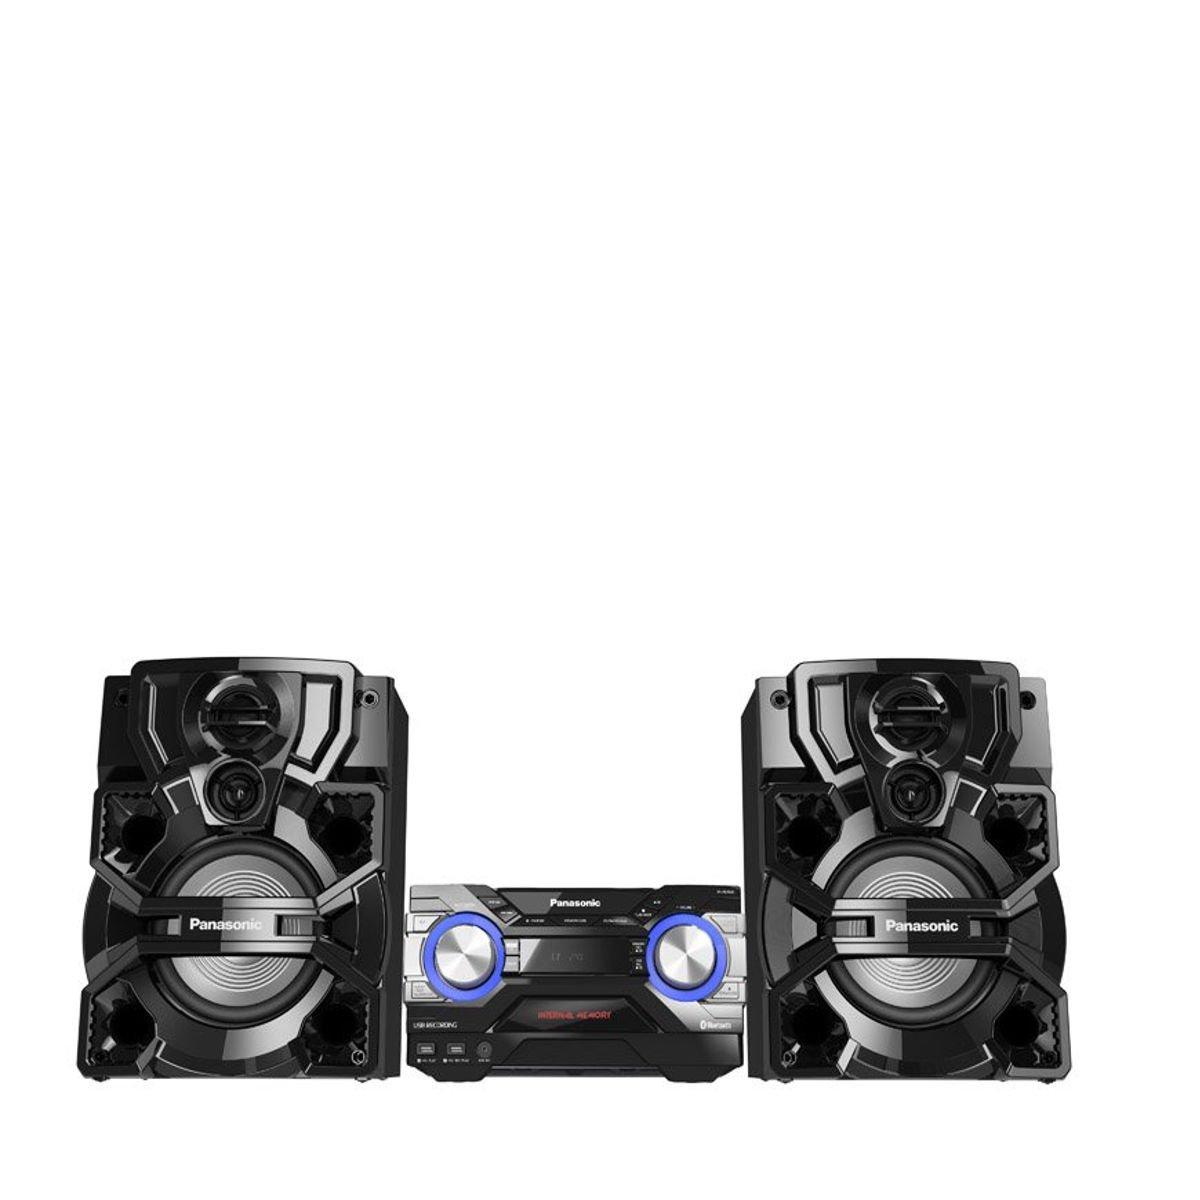 Minicomponente Akx660 Panasonic